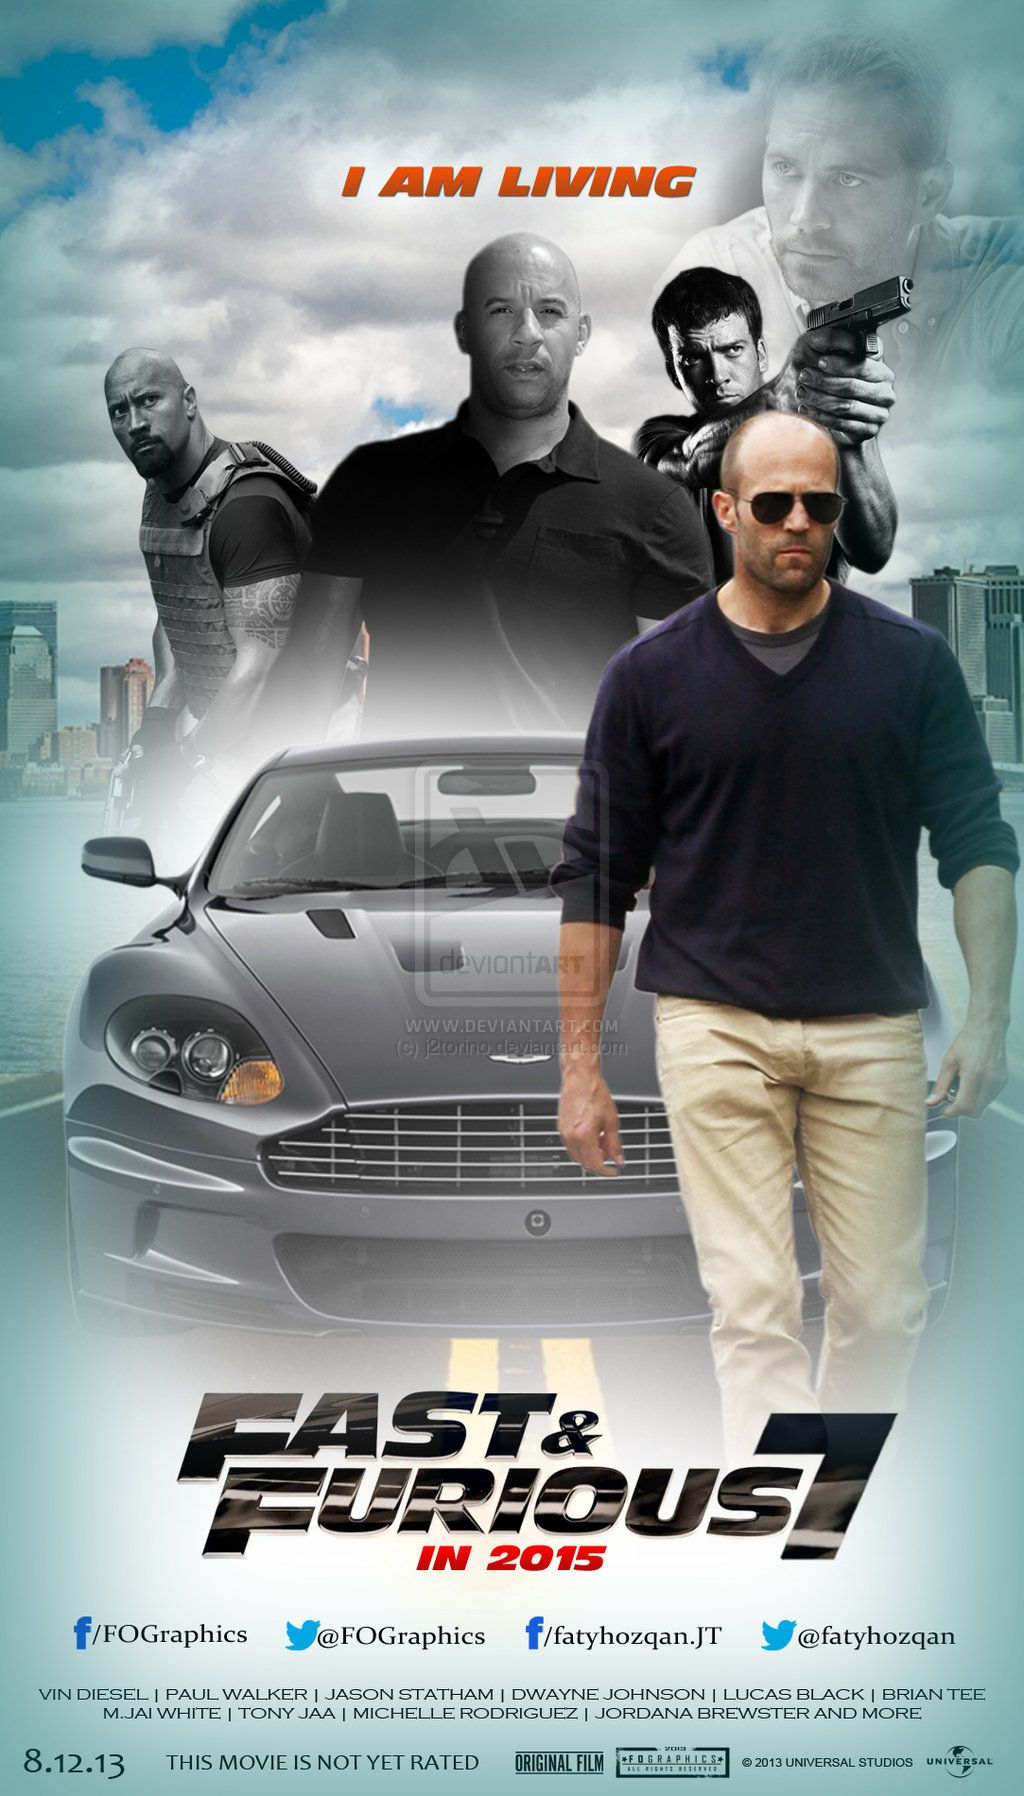 Furious Seven 2015 Pg 13 Stars Vin Diesel Paul Walker Dwayne Johnson Deckard Shaw Seeks Rev Movie Fast And Furious Furious Movie Fast And Furious